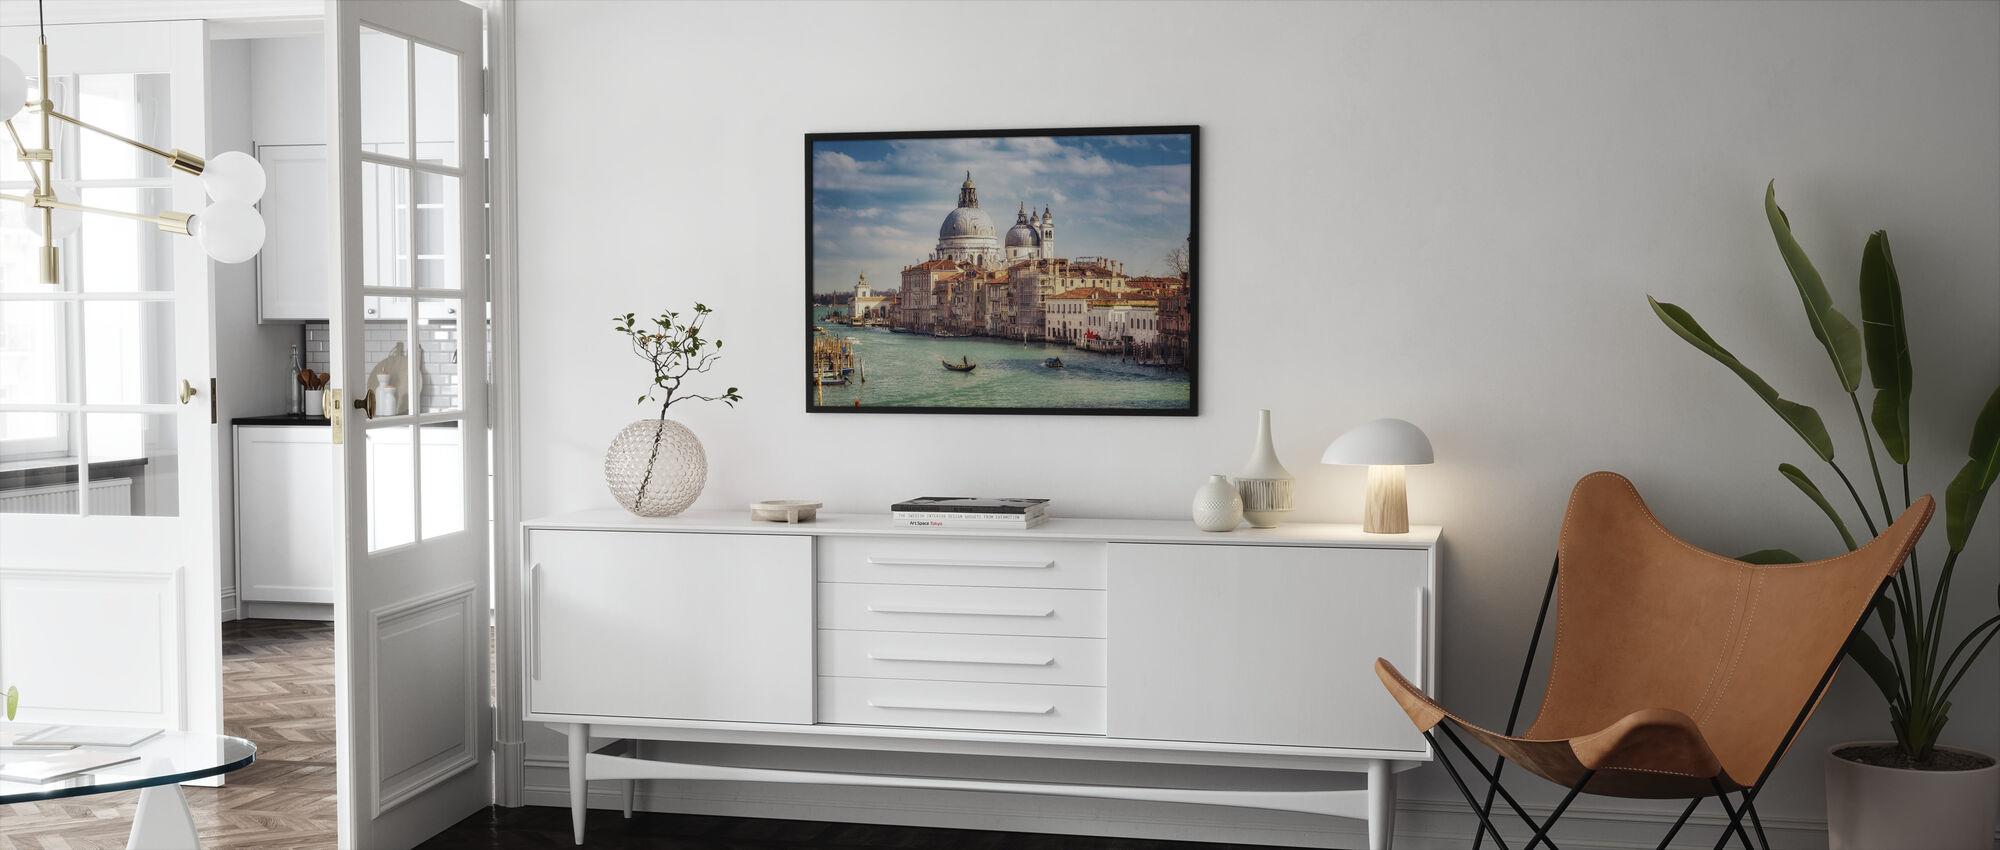 Basilica Santa Maria della Salute in Venice - Framed print - Living Room